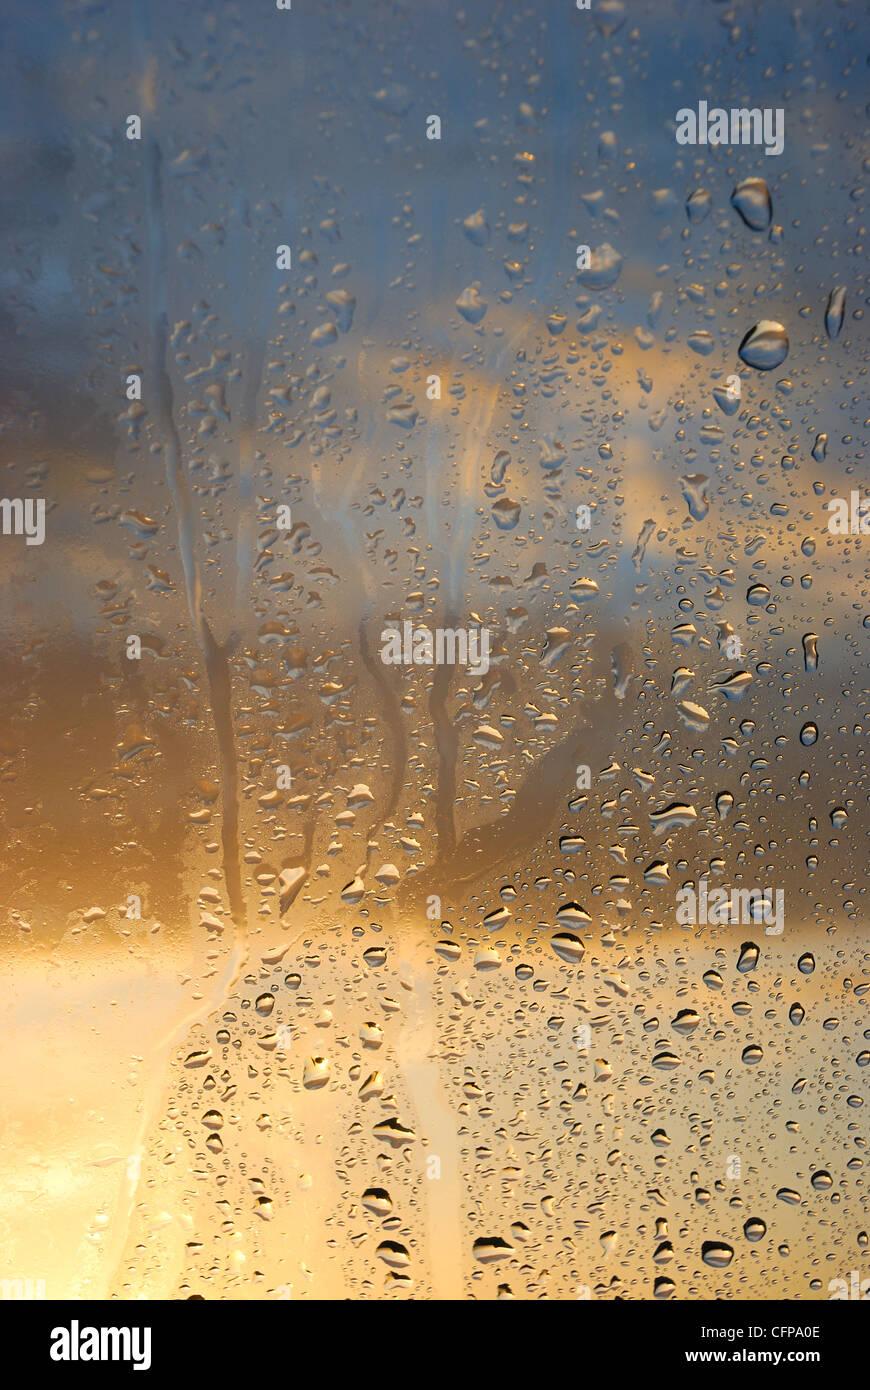 Kondenswasser am Fenster Stockbild